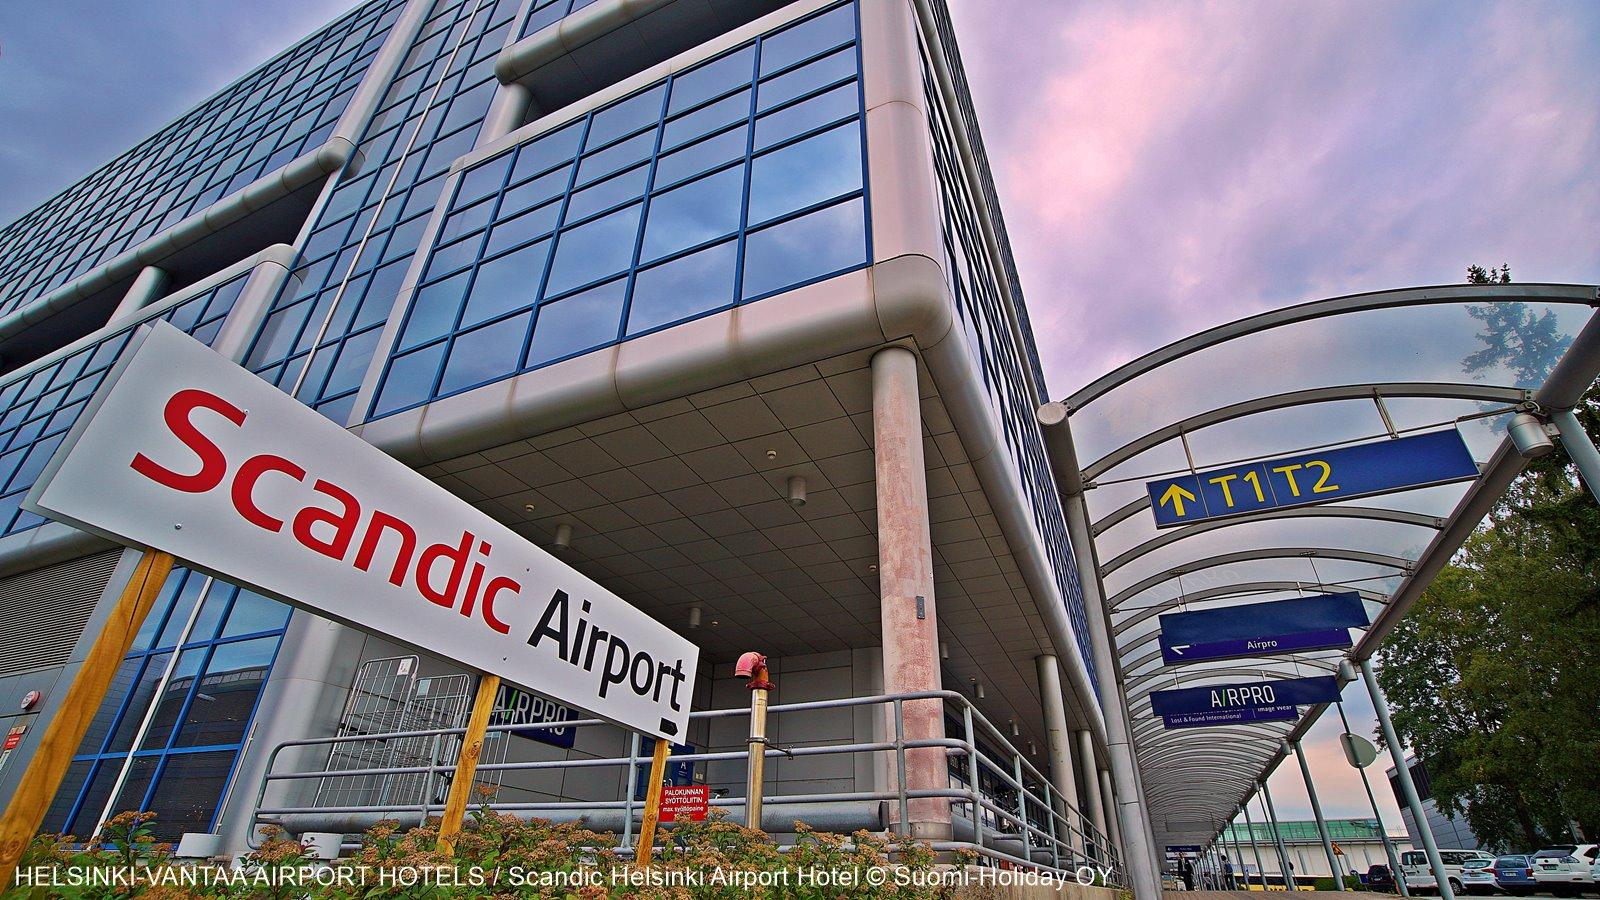 Helsinki airport hotels